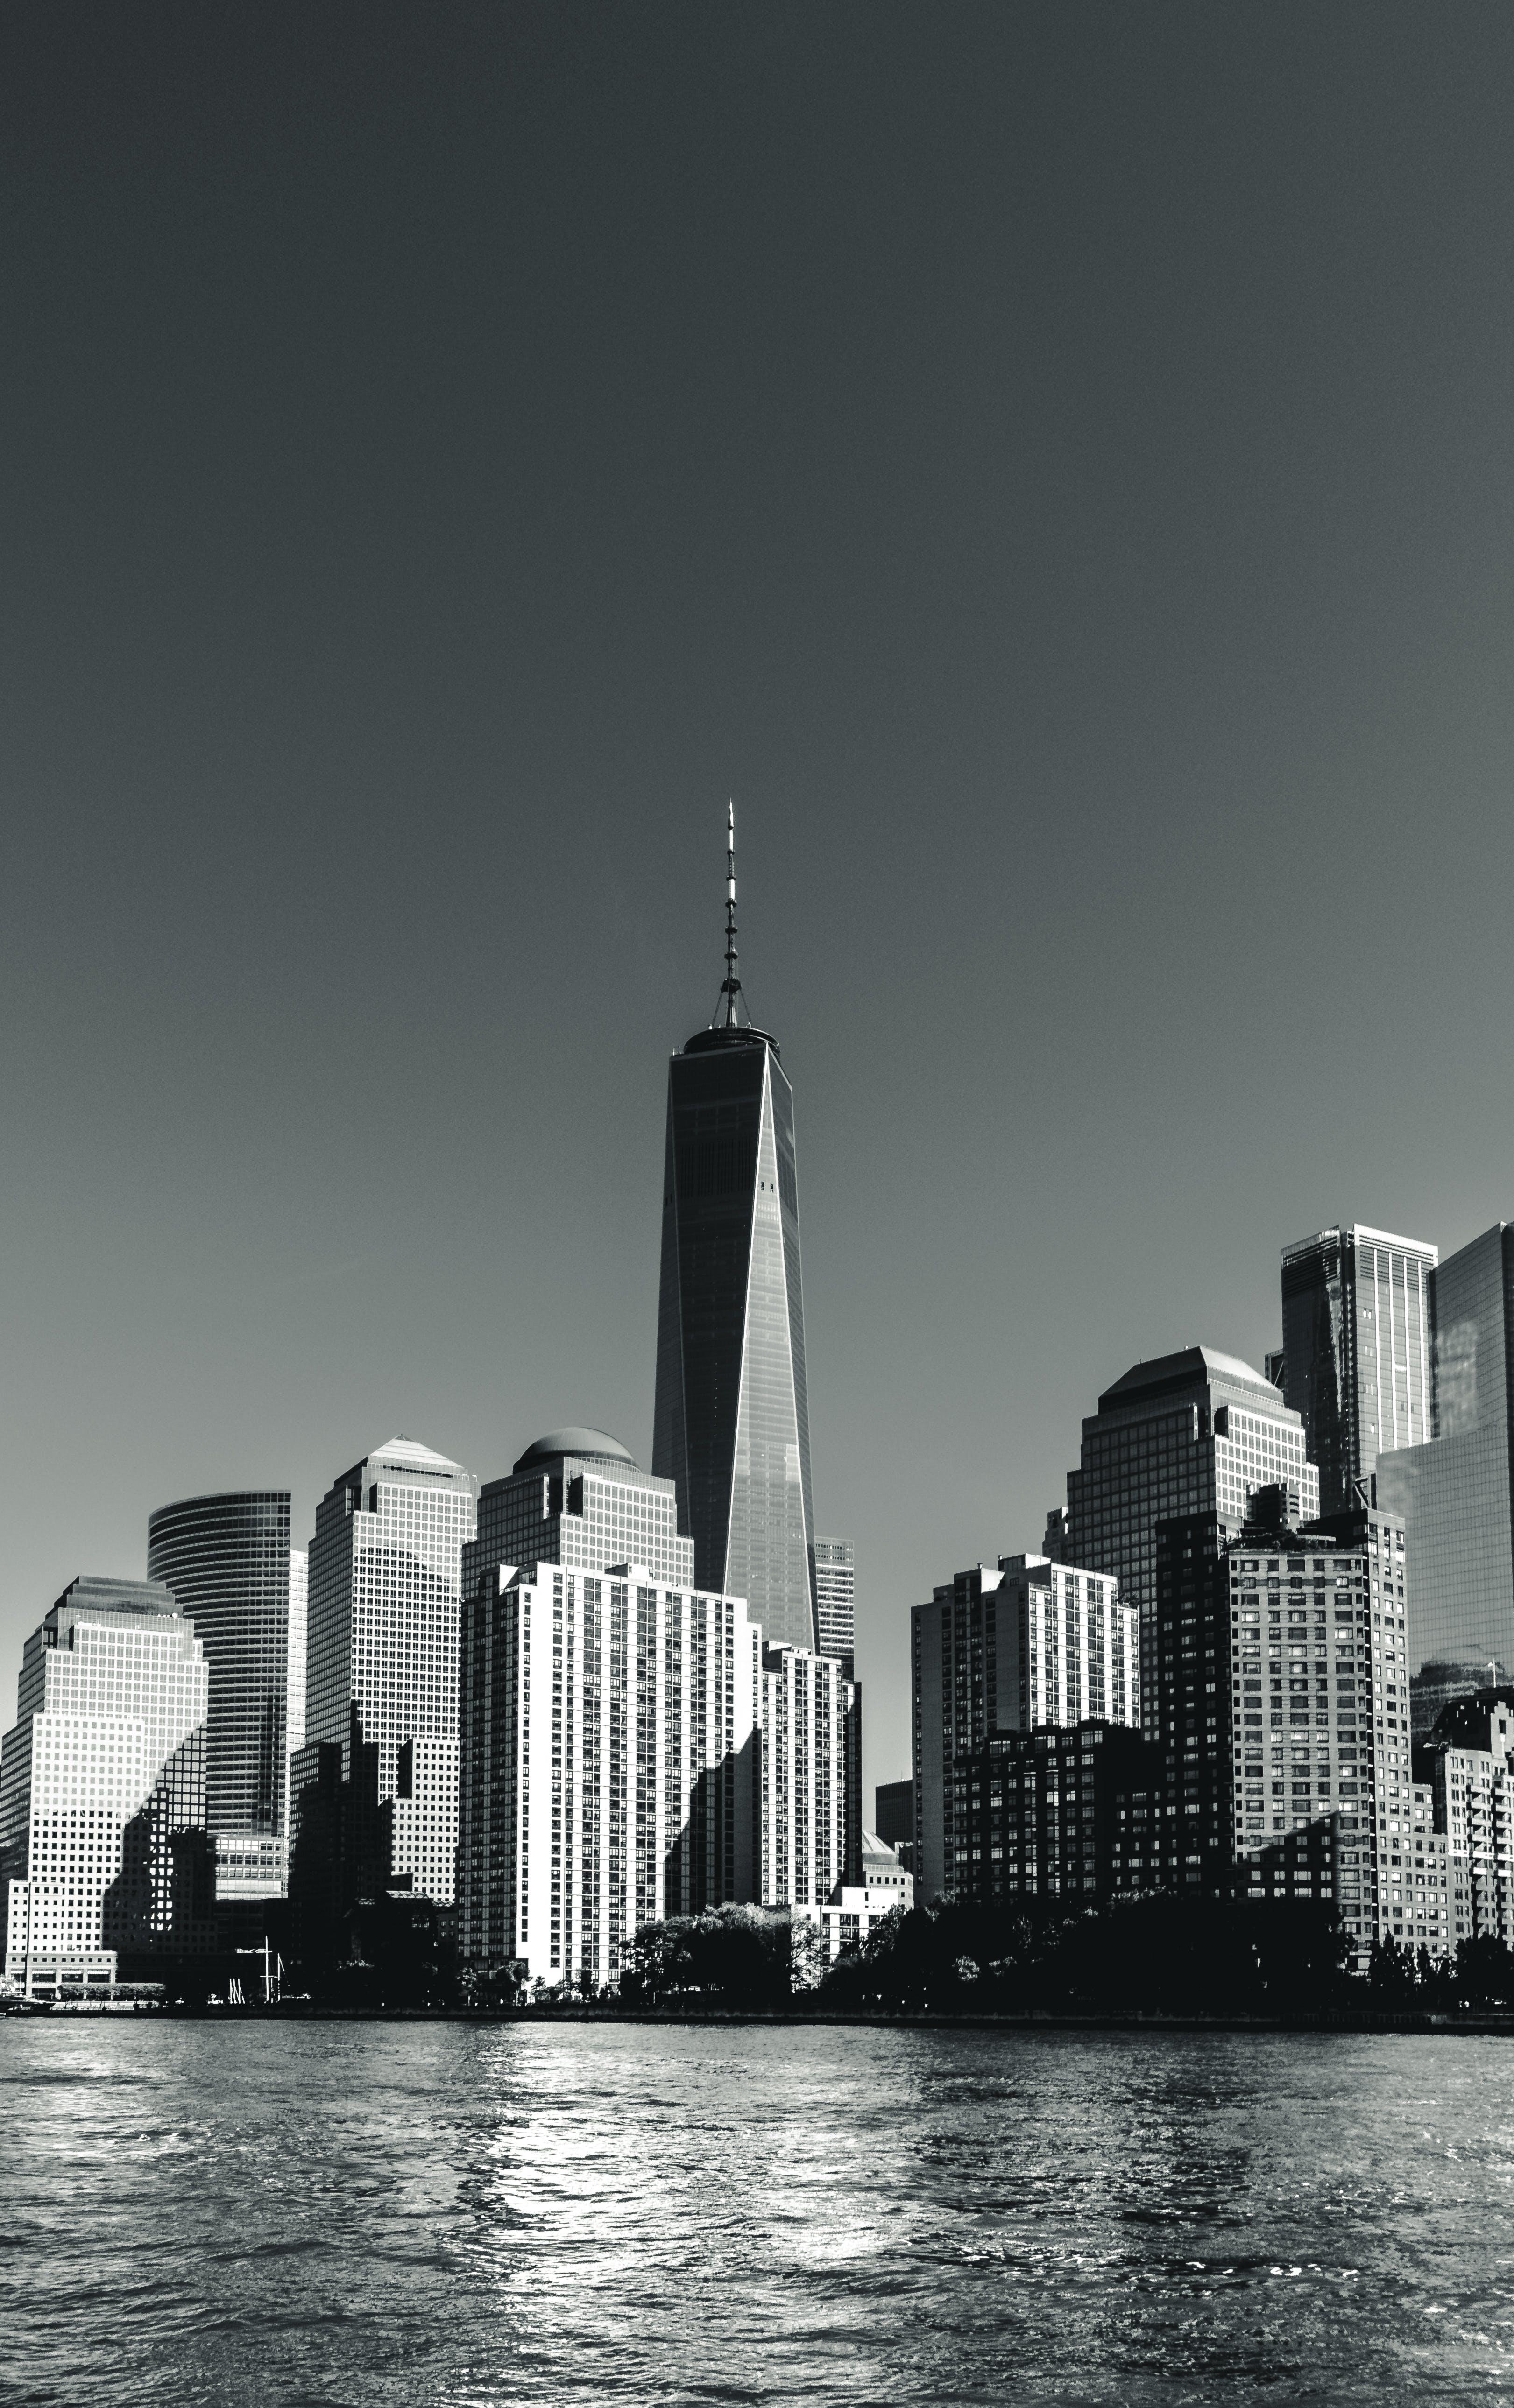 Monochrome Photo of City